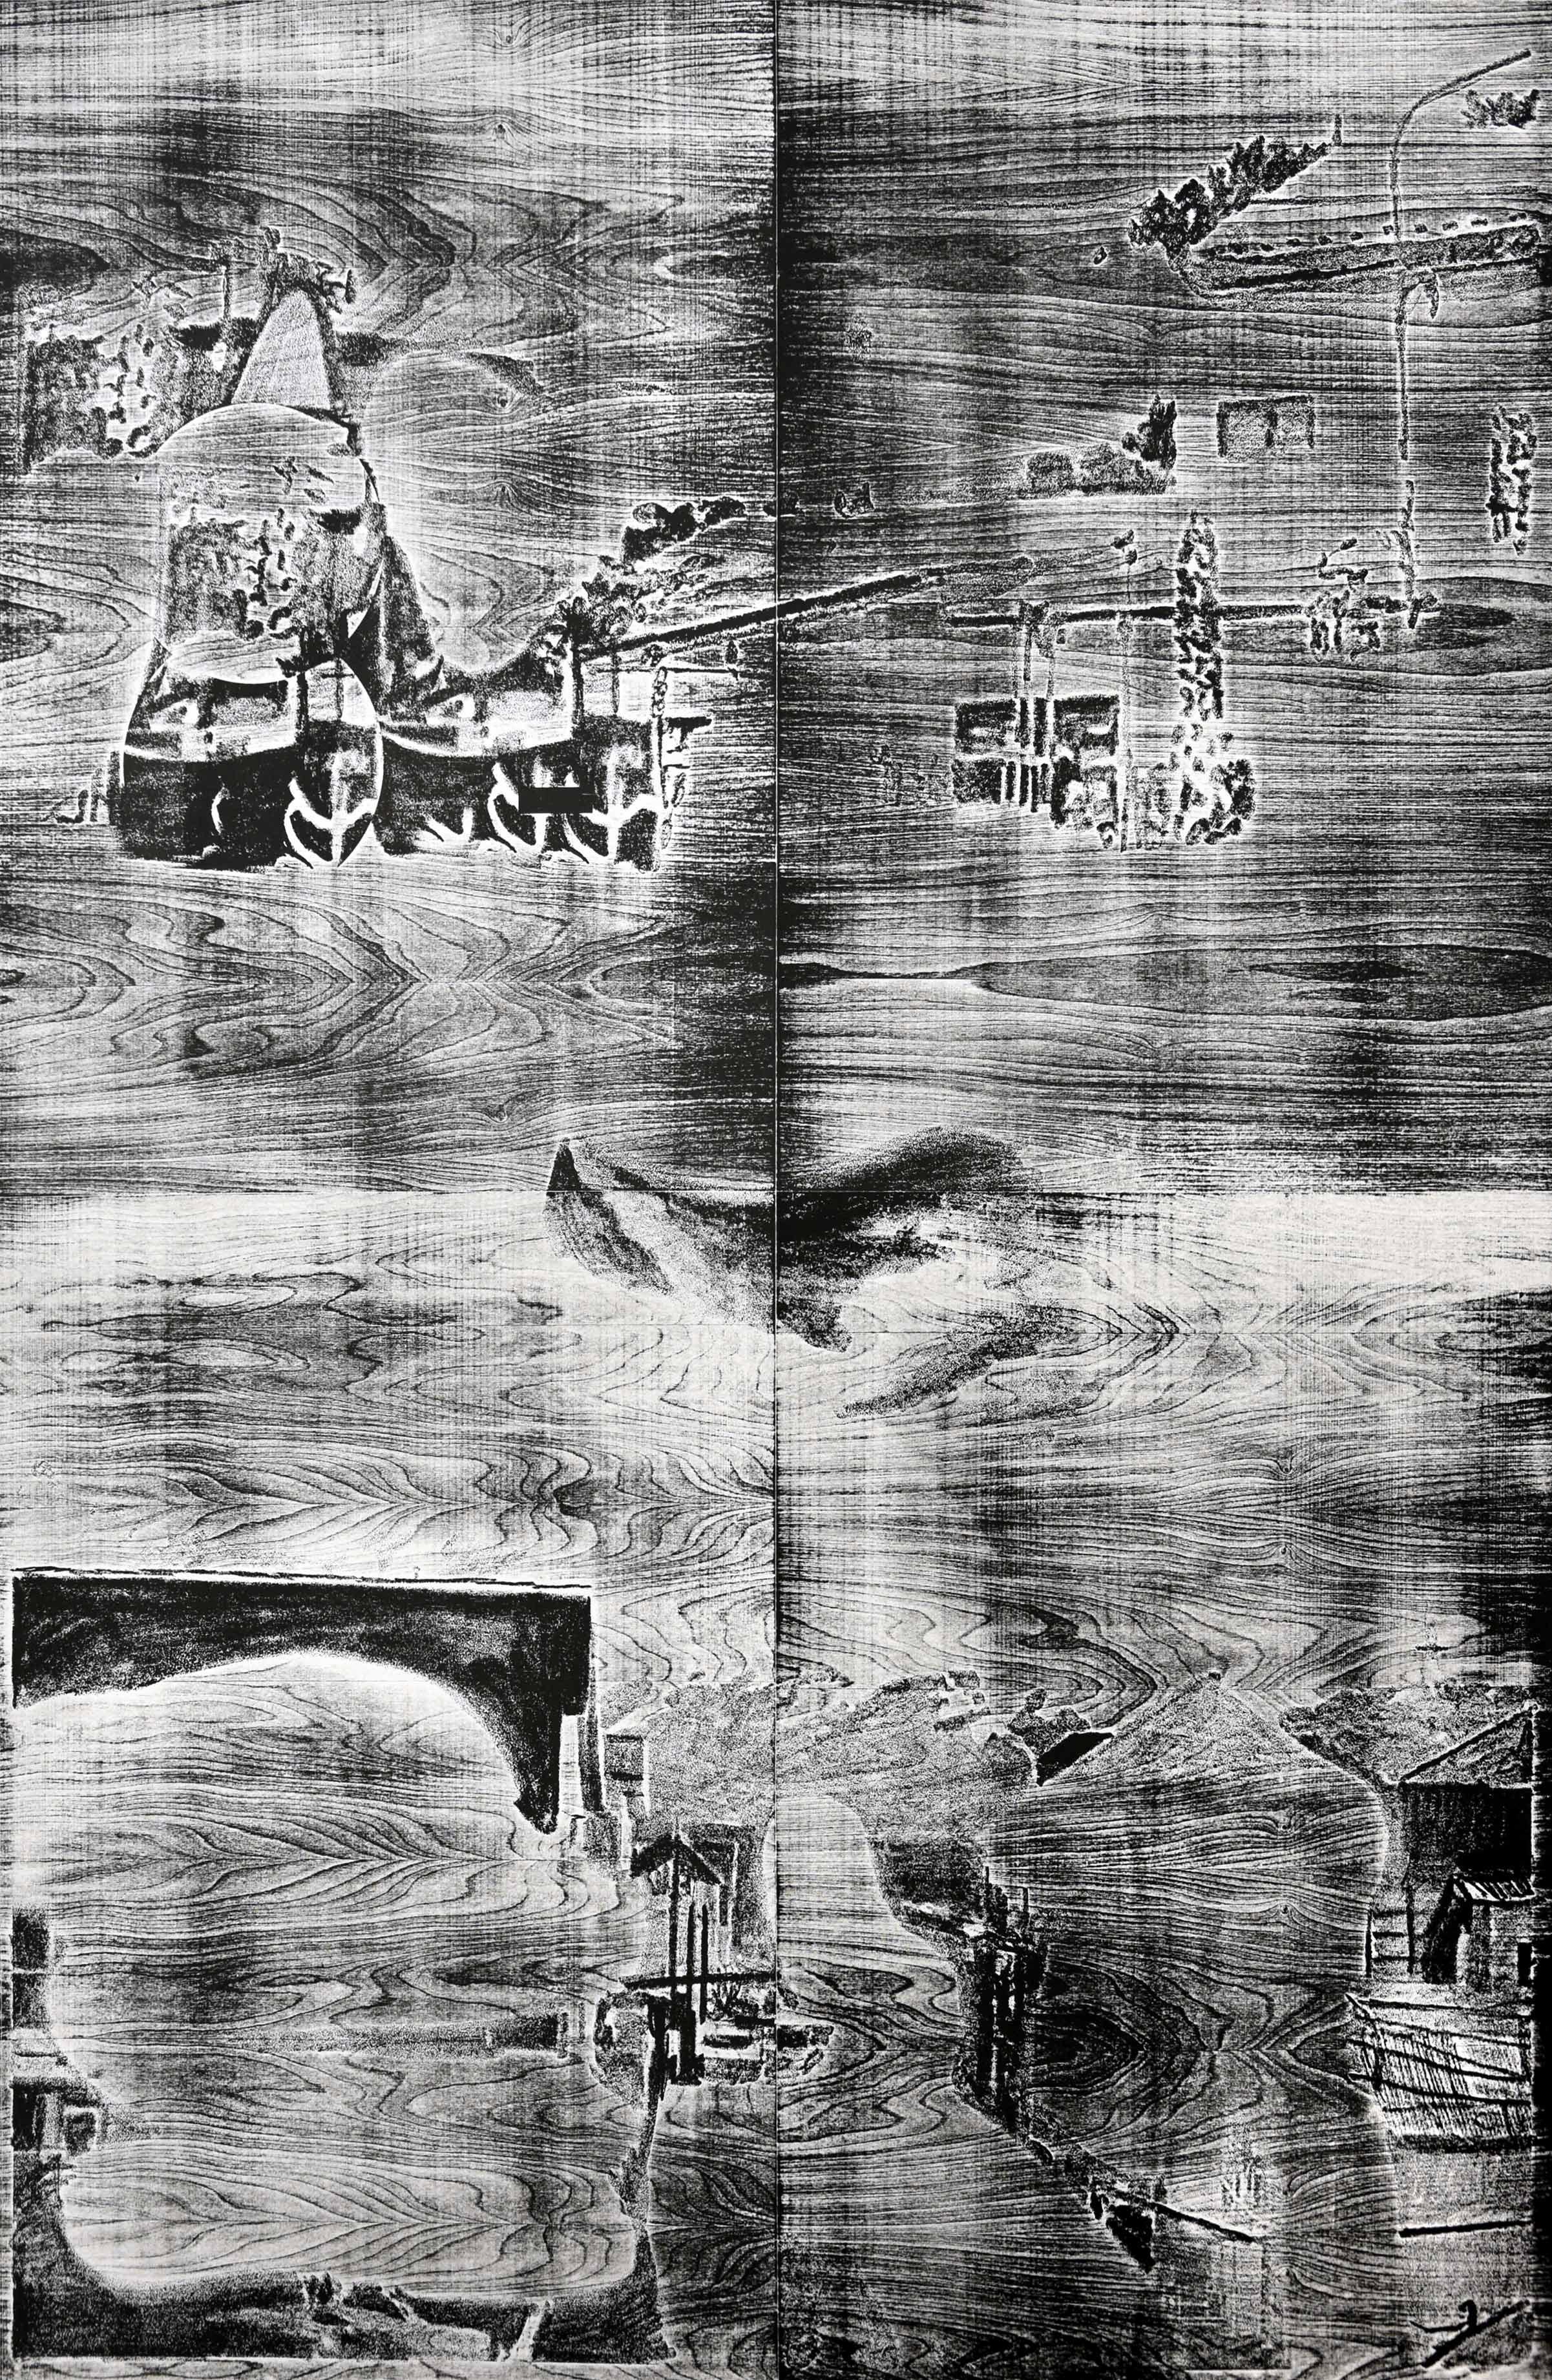 """fin del mundo maipu guarani fuegia basket""; woodcut, laserdrawing; 184,2x120,1cm; 2018 Genaro Strobel"